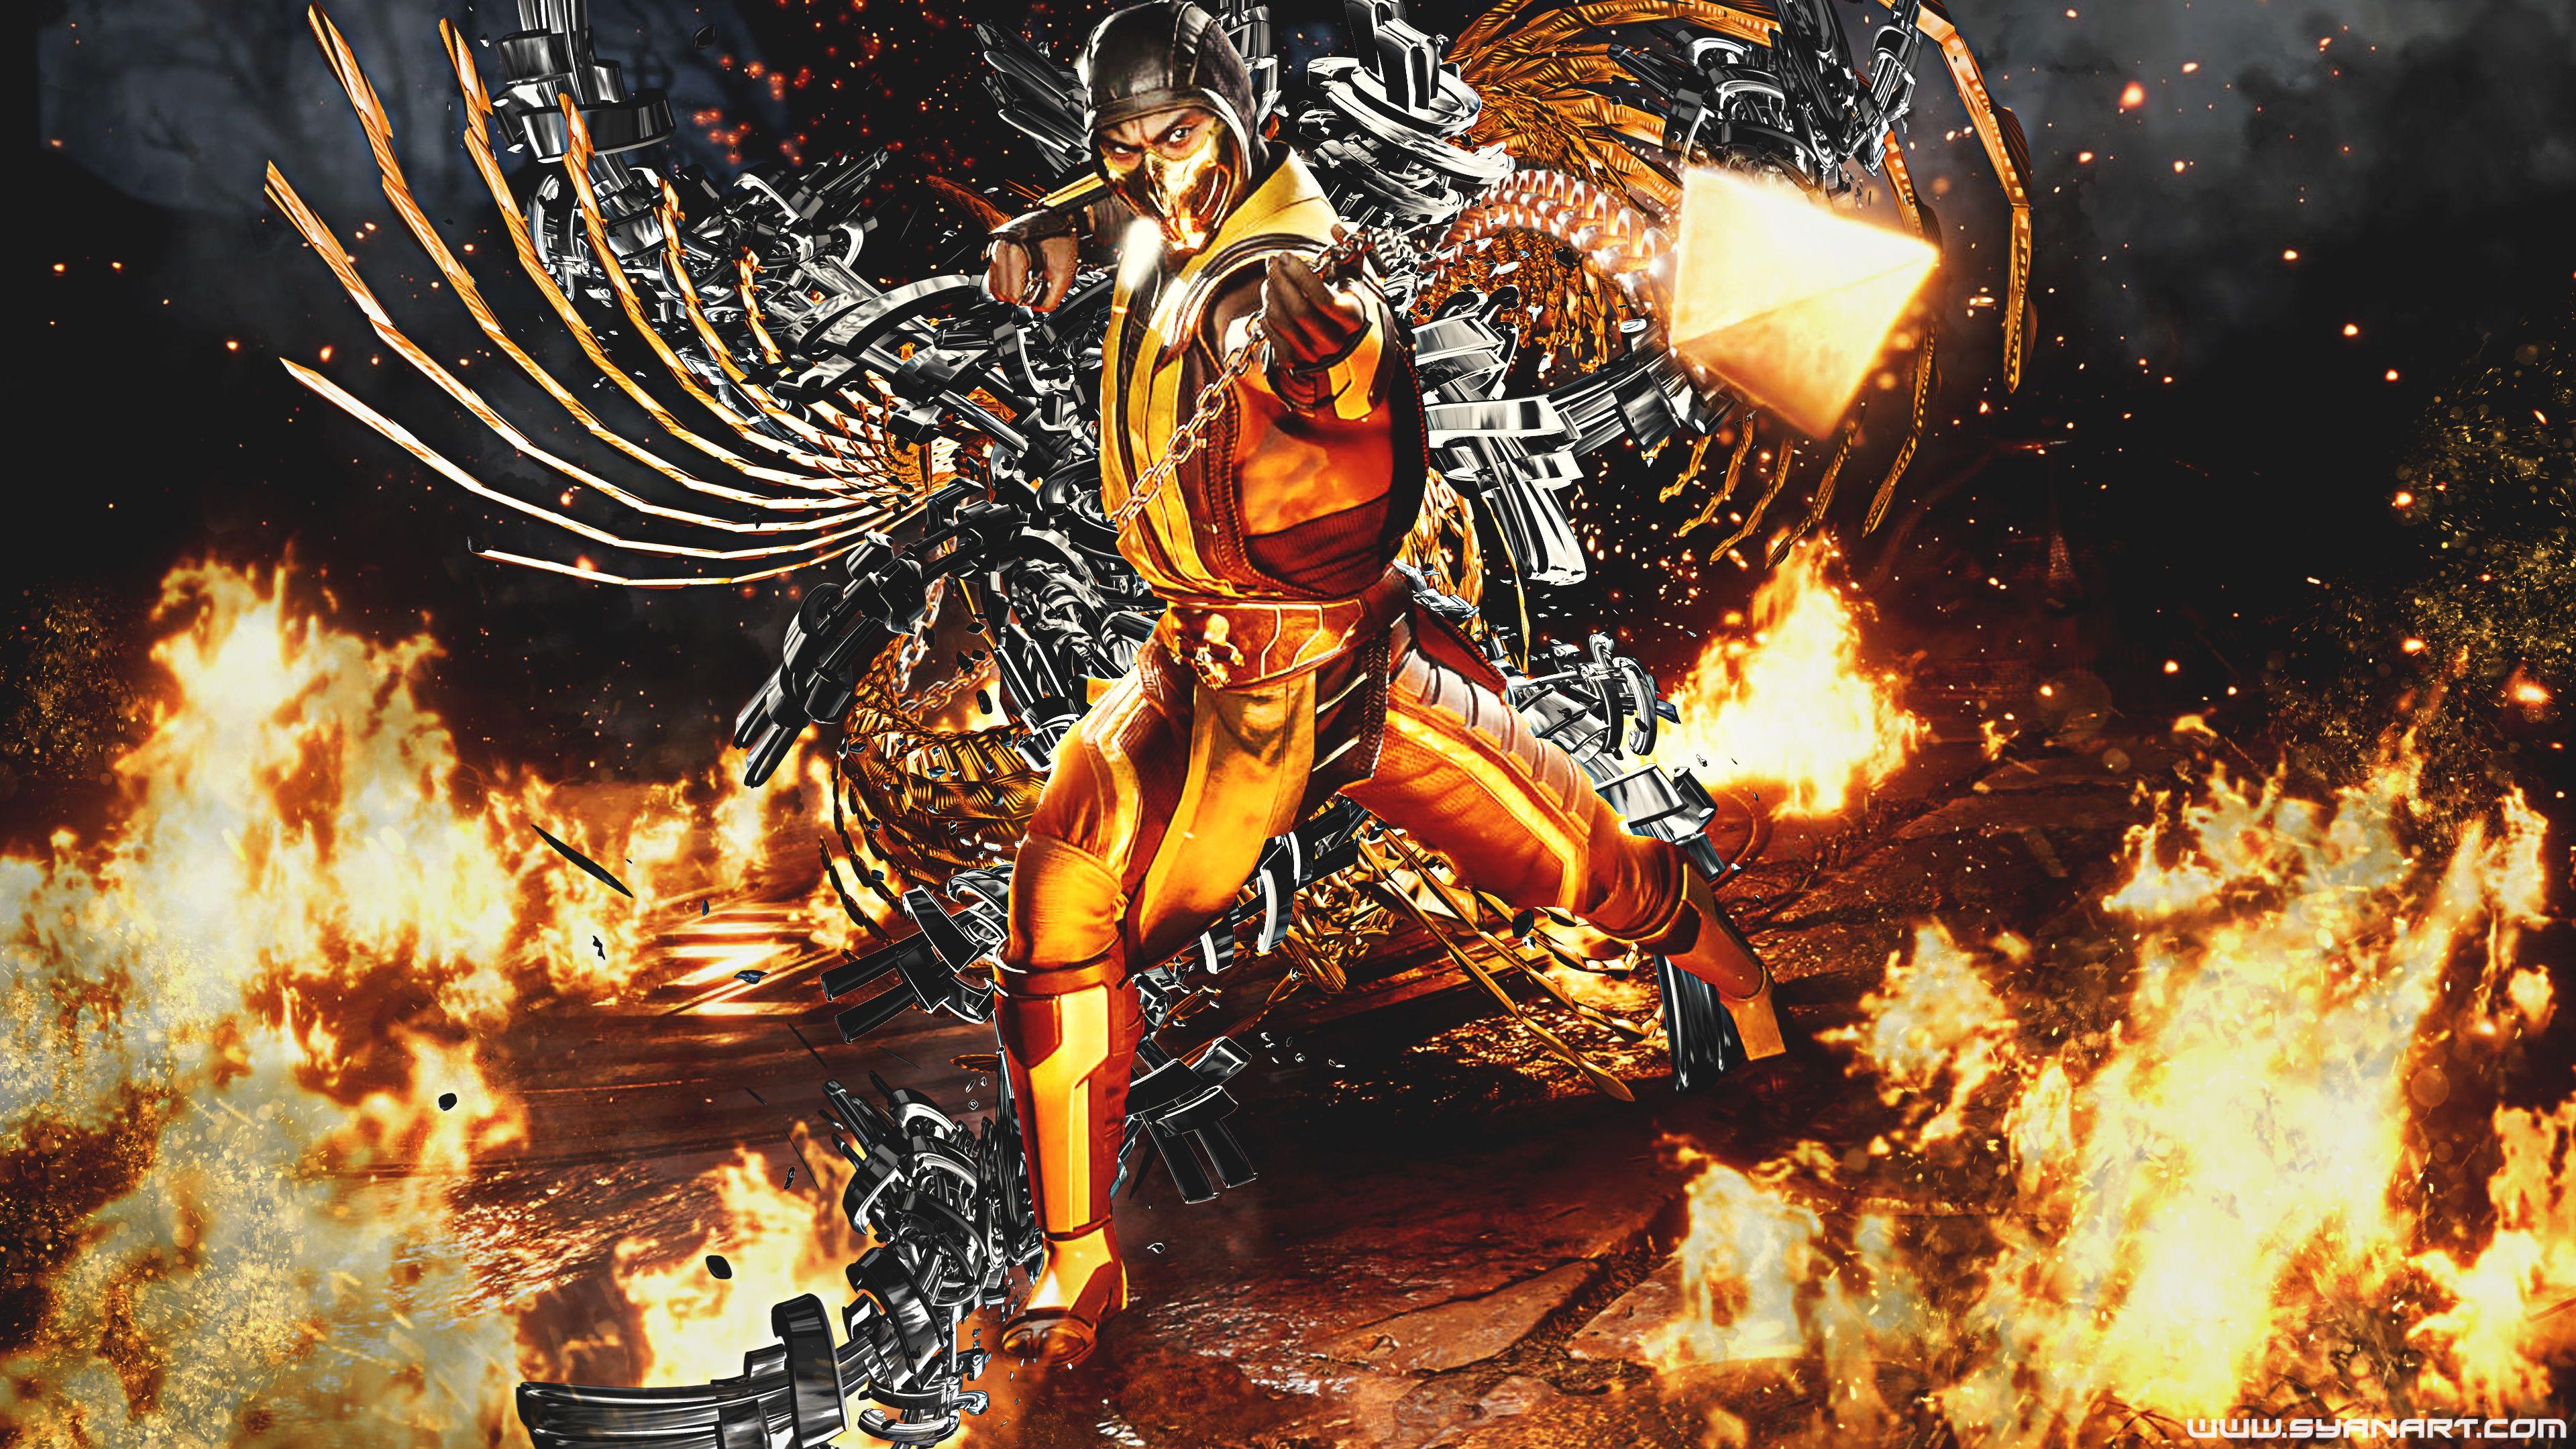 Mortal Kombat 11 Classic Scorpion 4k Wallpaper Mortal Kombat Gaming Wallpapers Best Gaming Wallpapers